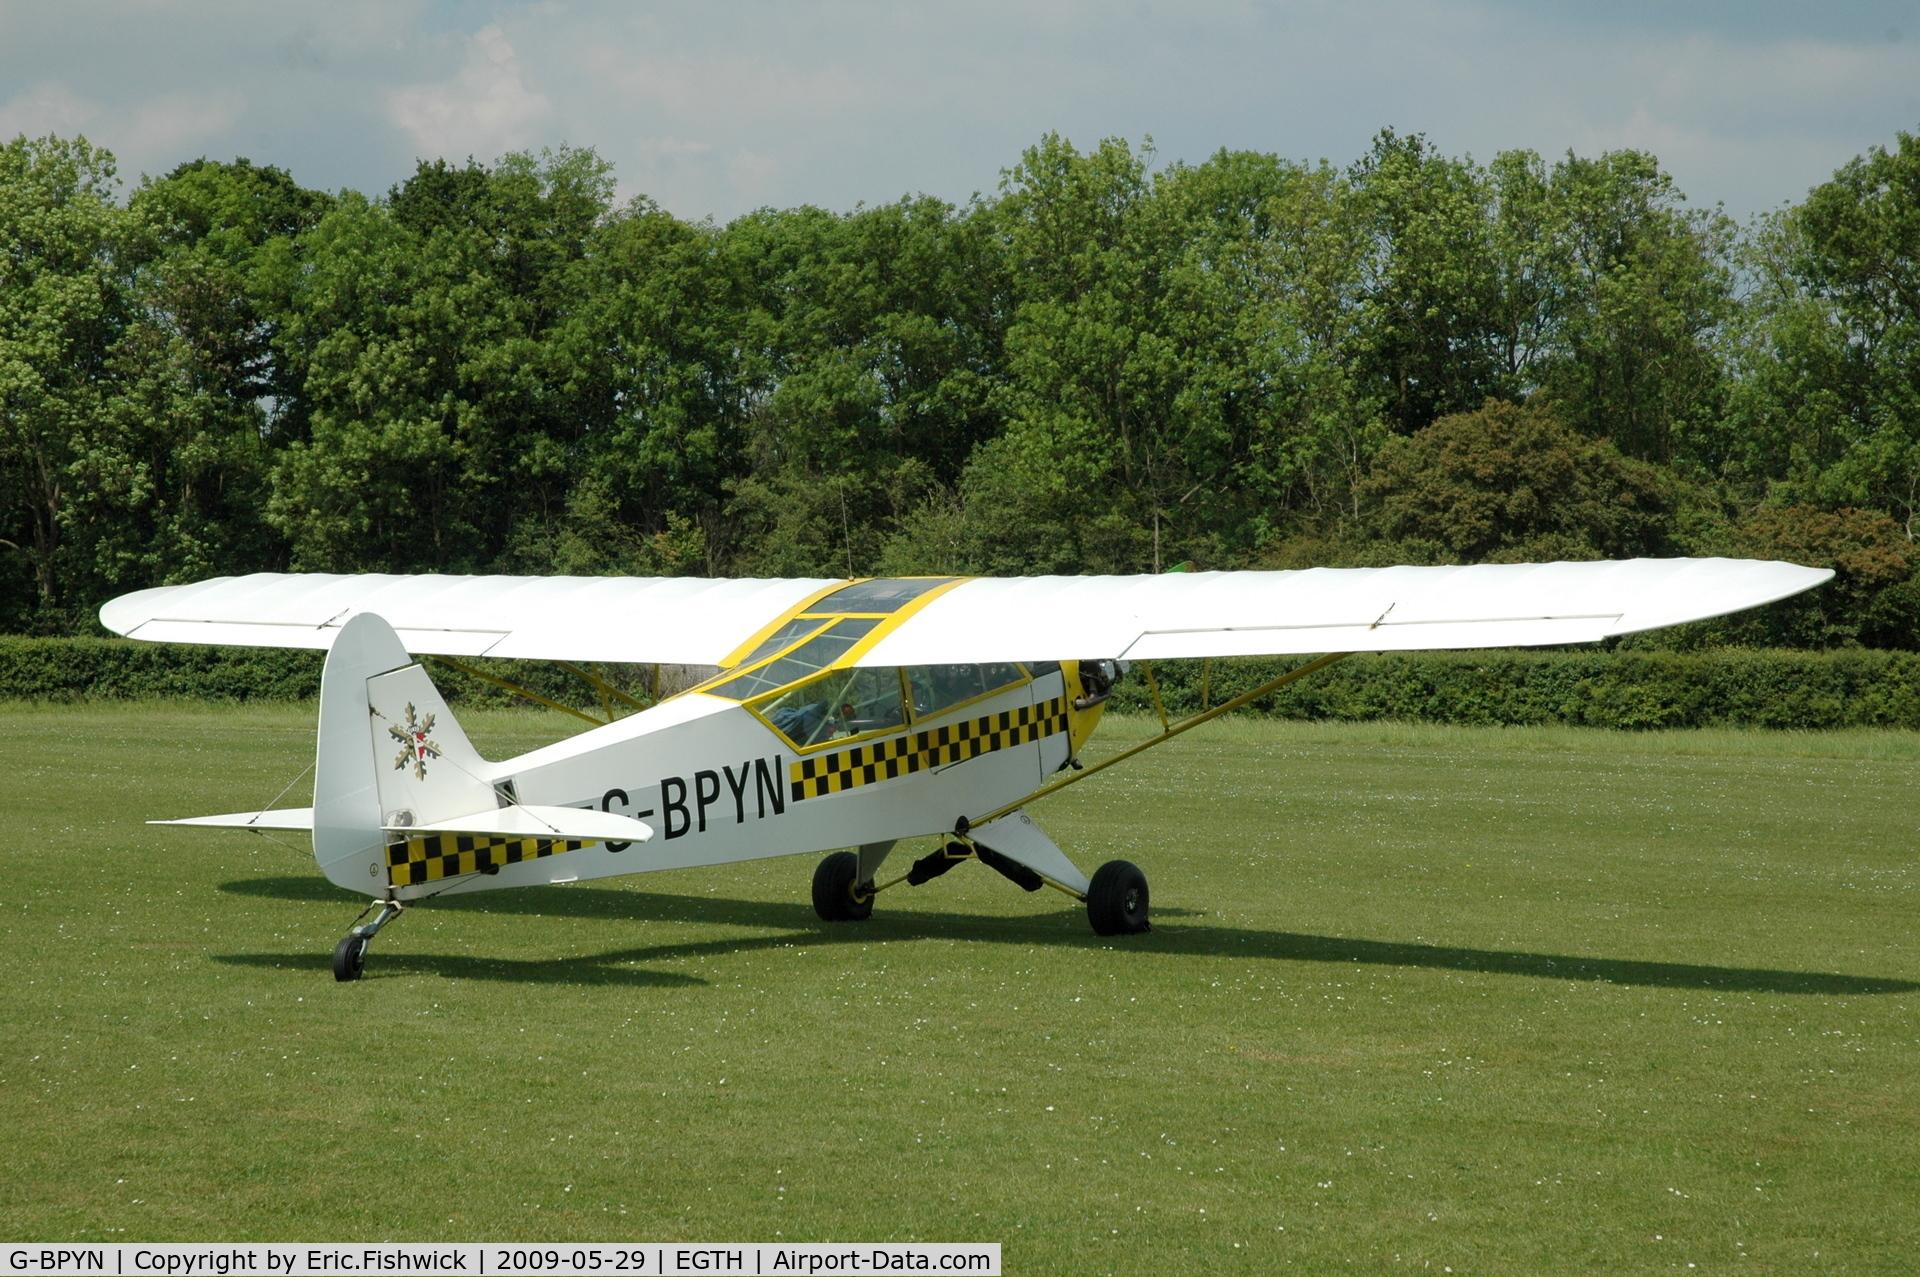 G-BPYN, 1943 Piper L-4H Grasshopper (J3C-65D) C/N 11422, 2. G-BPYN visiting Shuttleworth (Old Warden) Aerodrome.